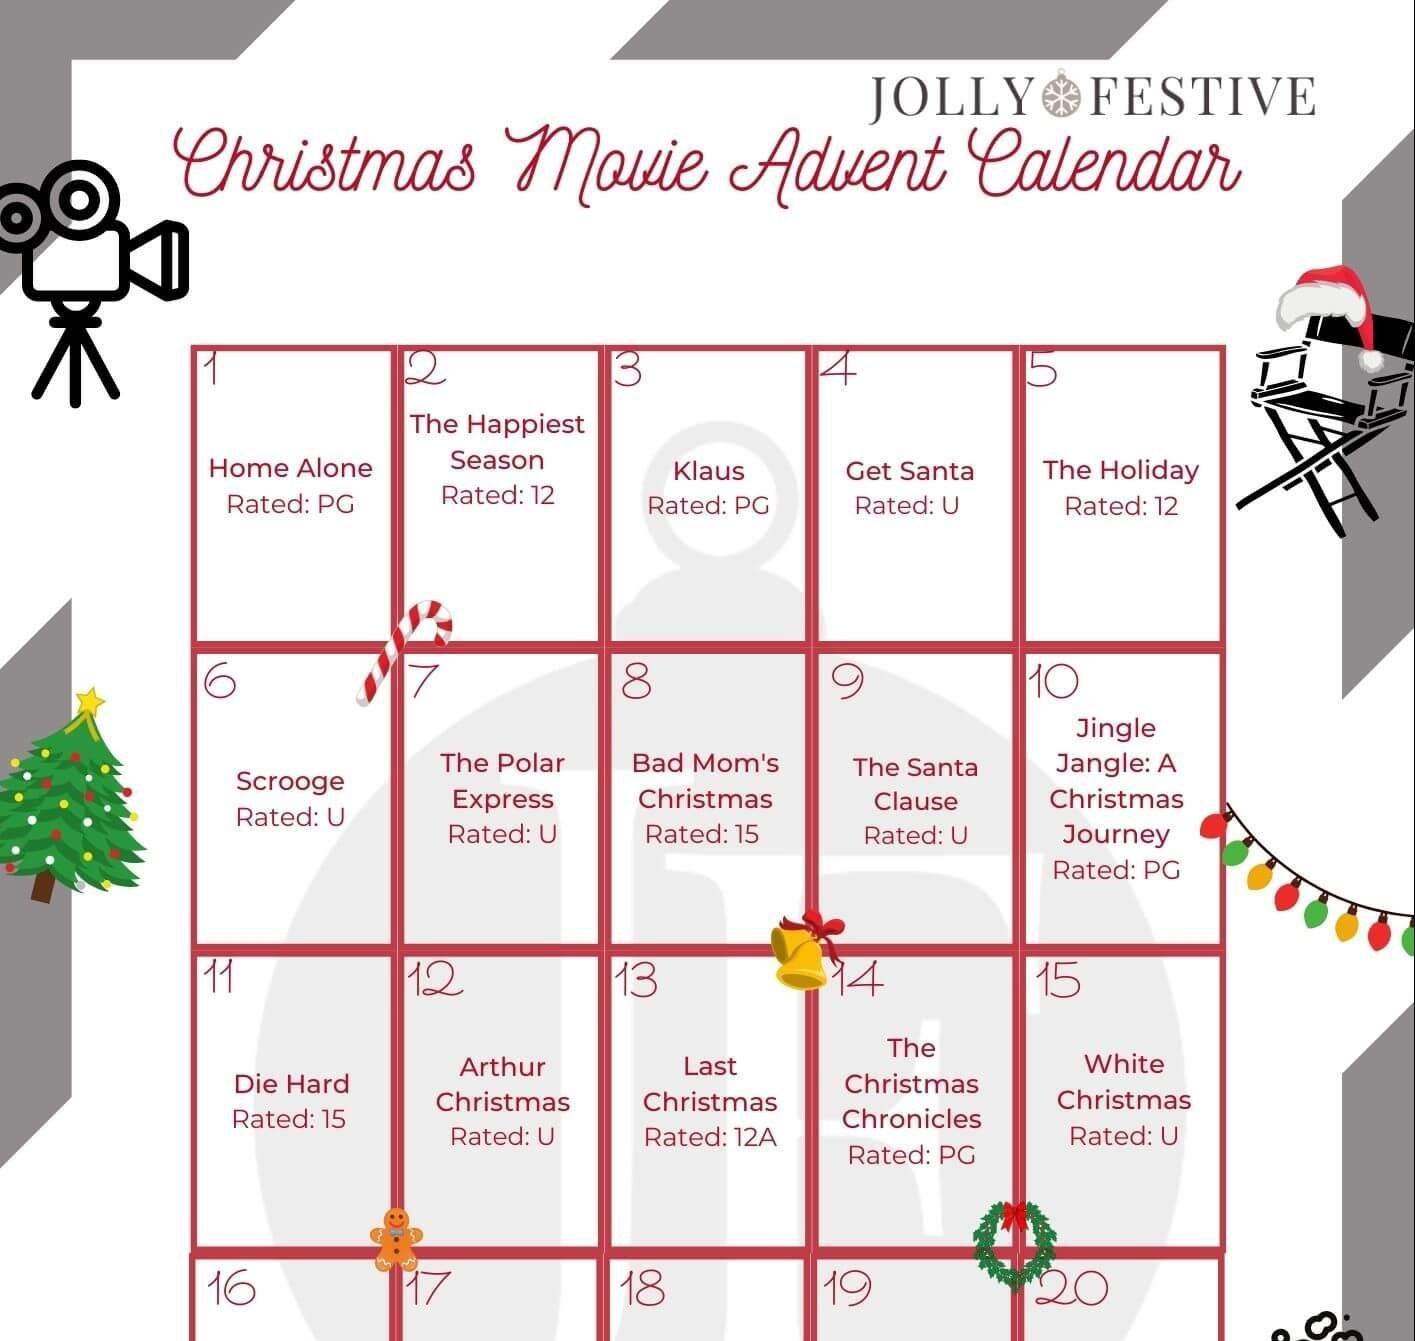 Jolly Festive's Christmas Movie Advent Calendar